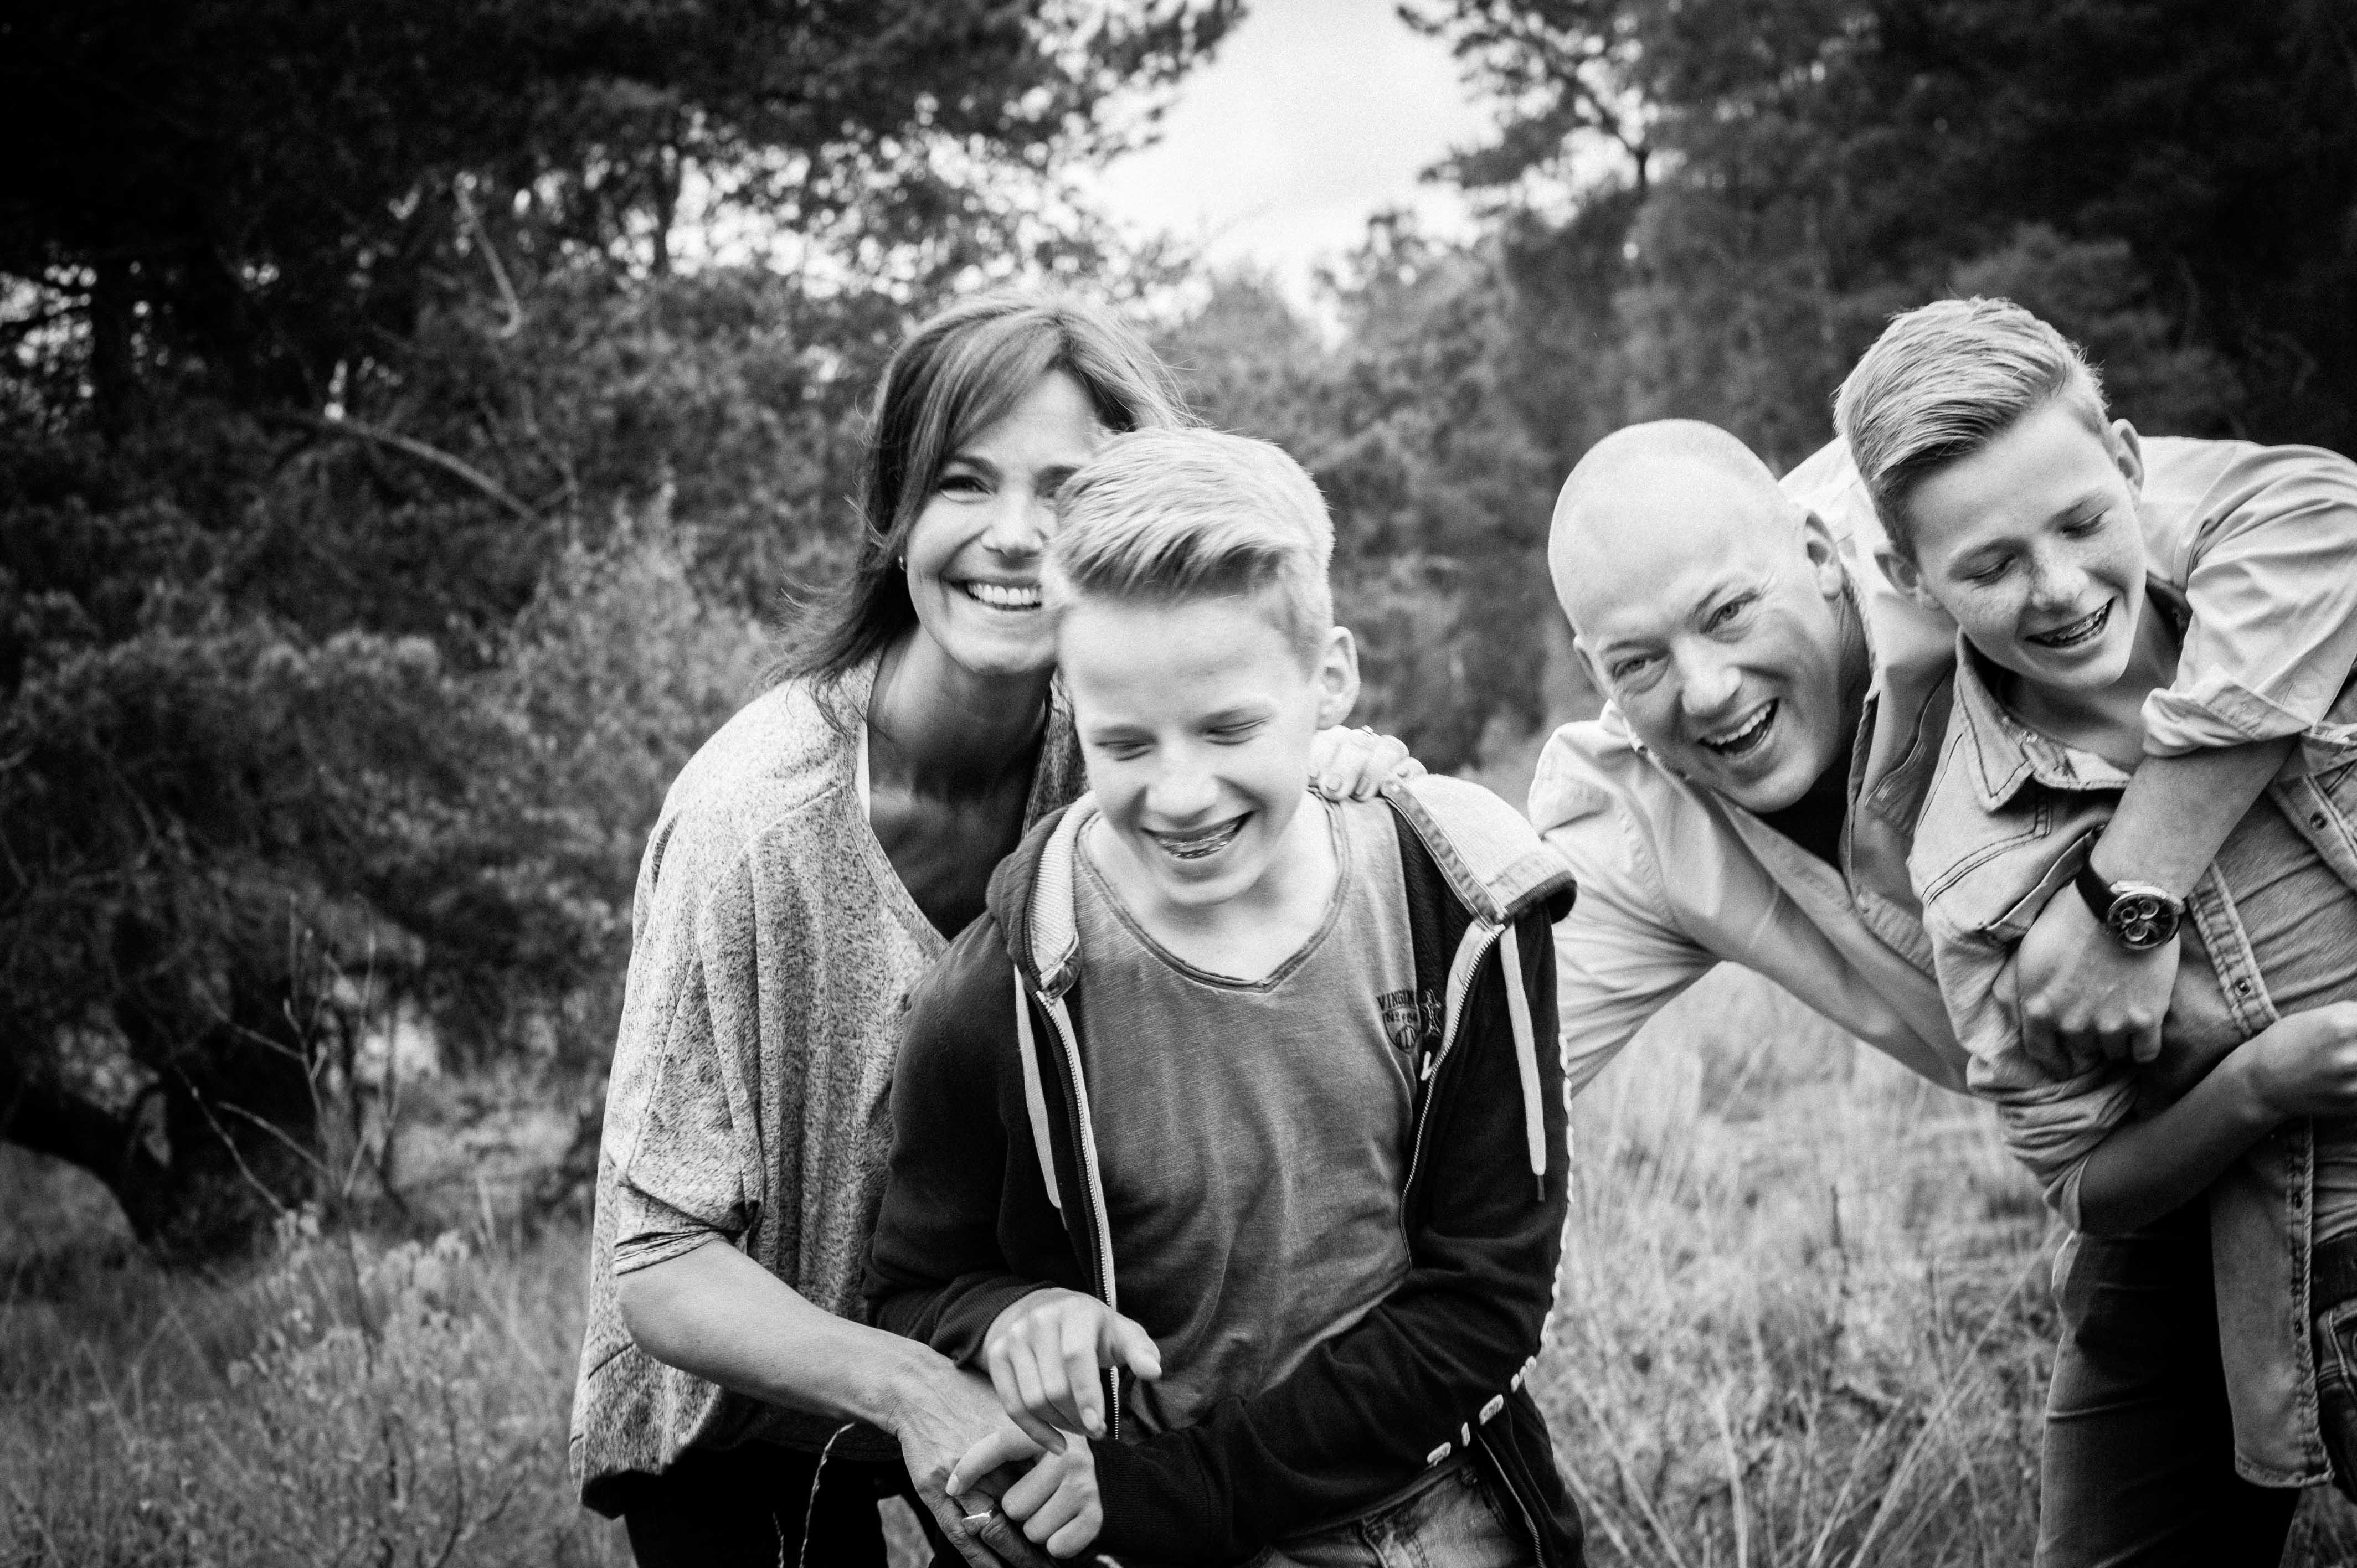 Familieportret | Sas|Hans|Dirk|Kees